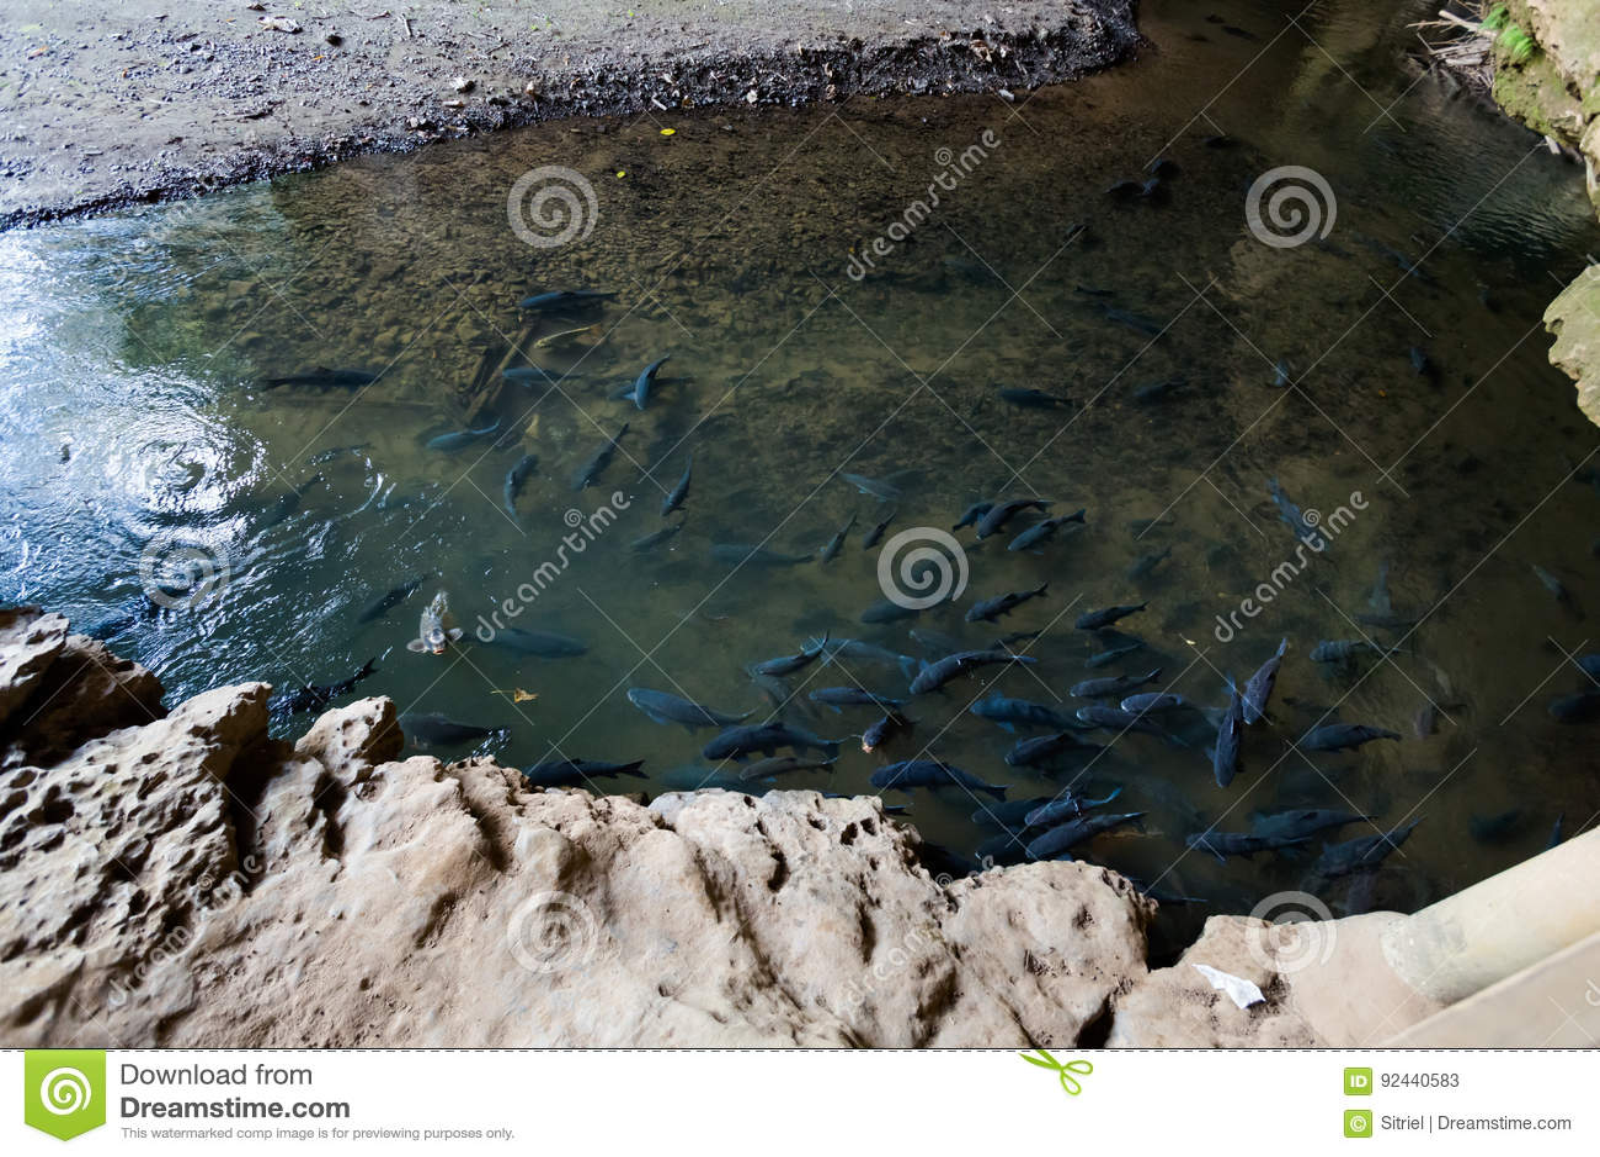 pond full of fish